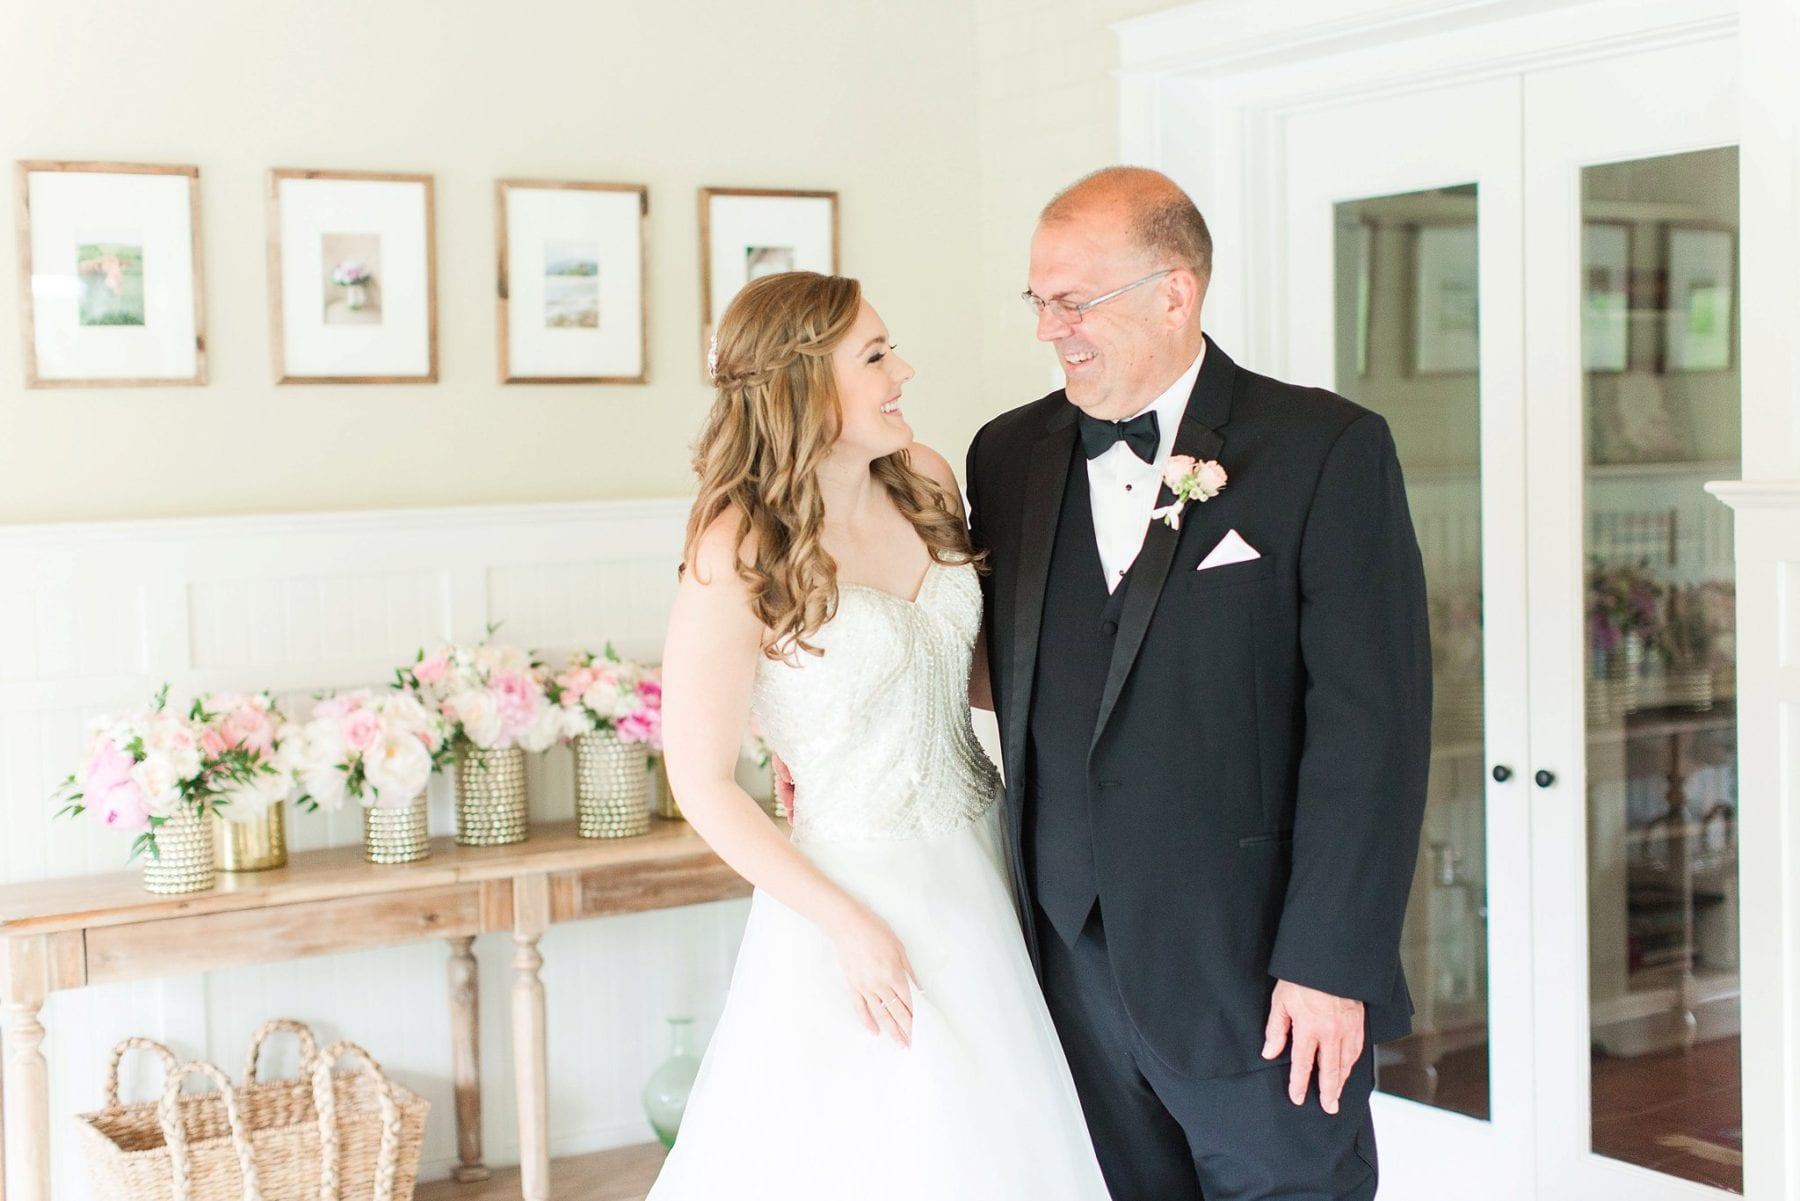 Justin & Megan Big Spring Farm Wedding Photos-58.jpg